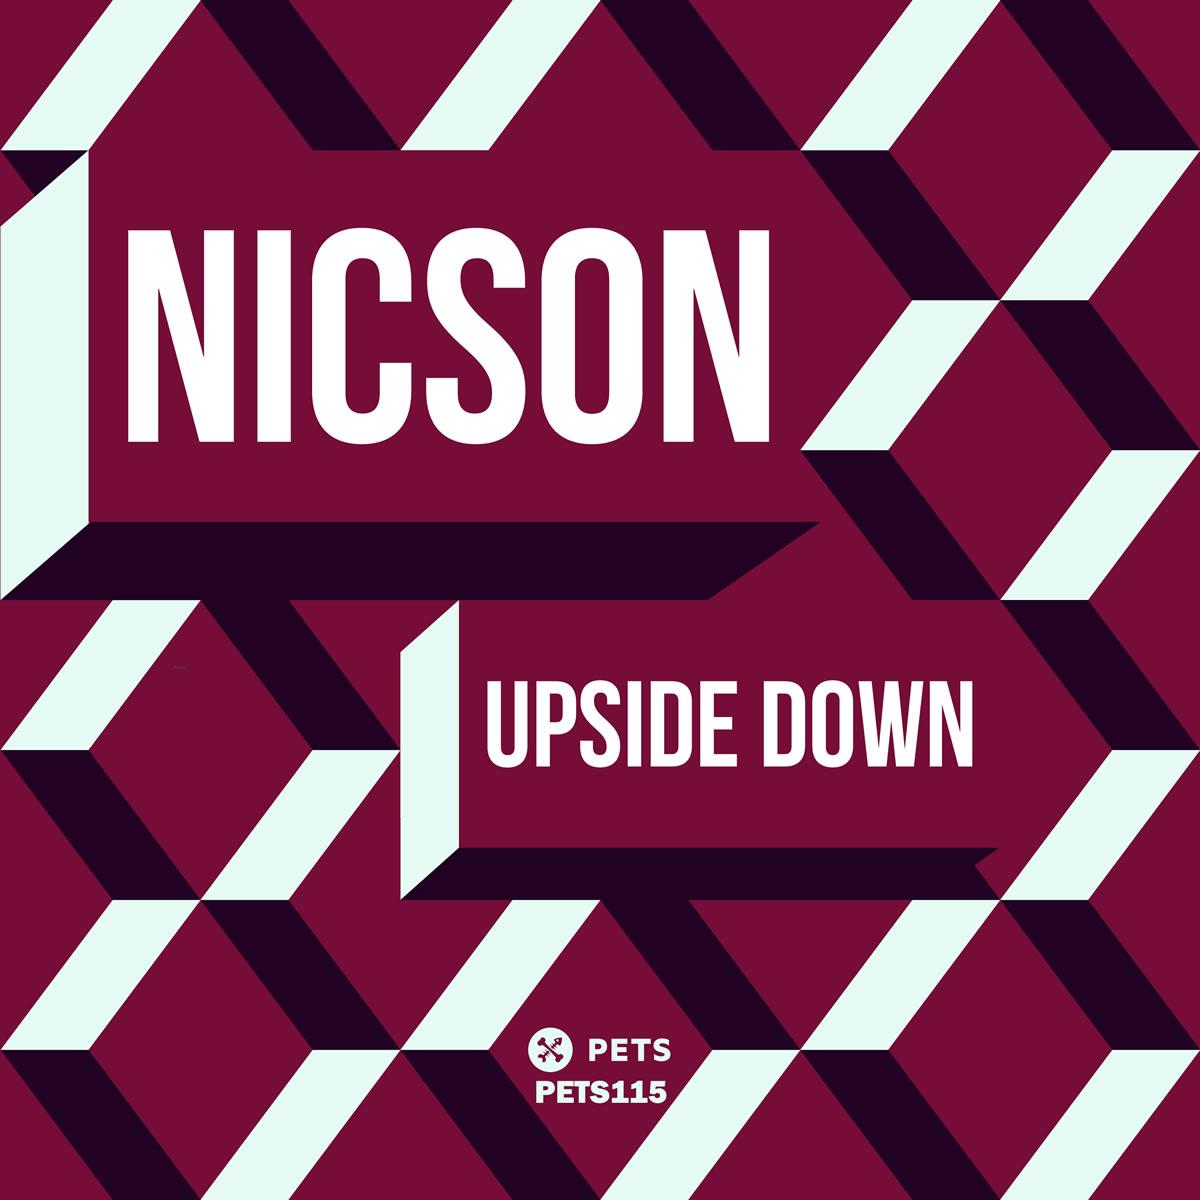 Nicson-Upside-Down.jpg